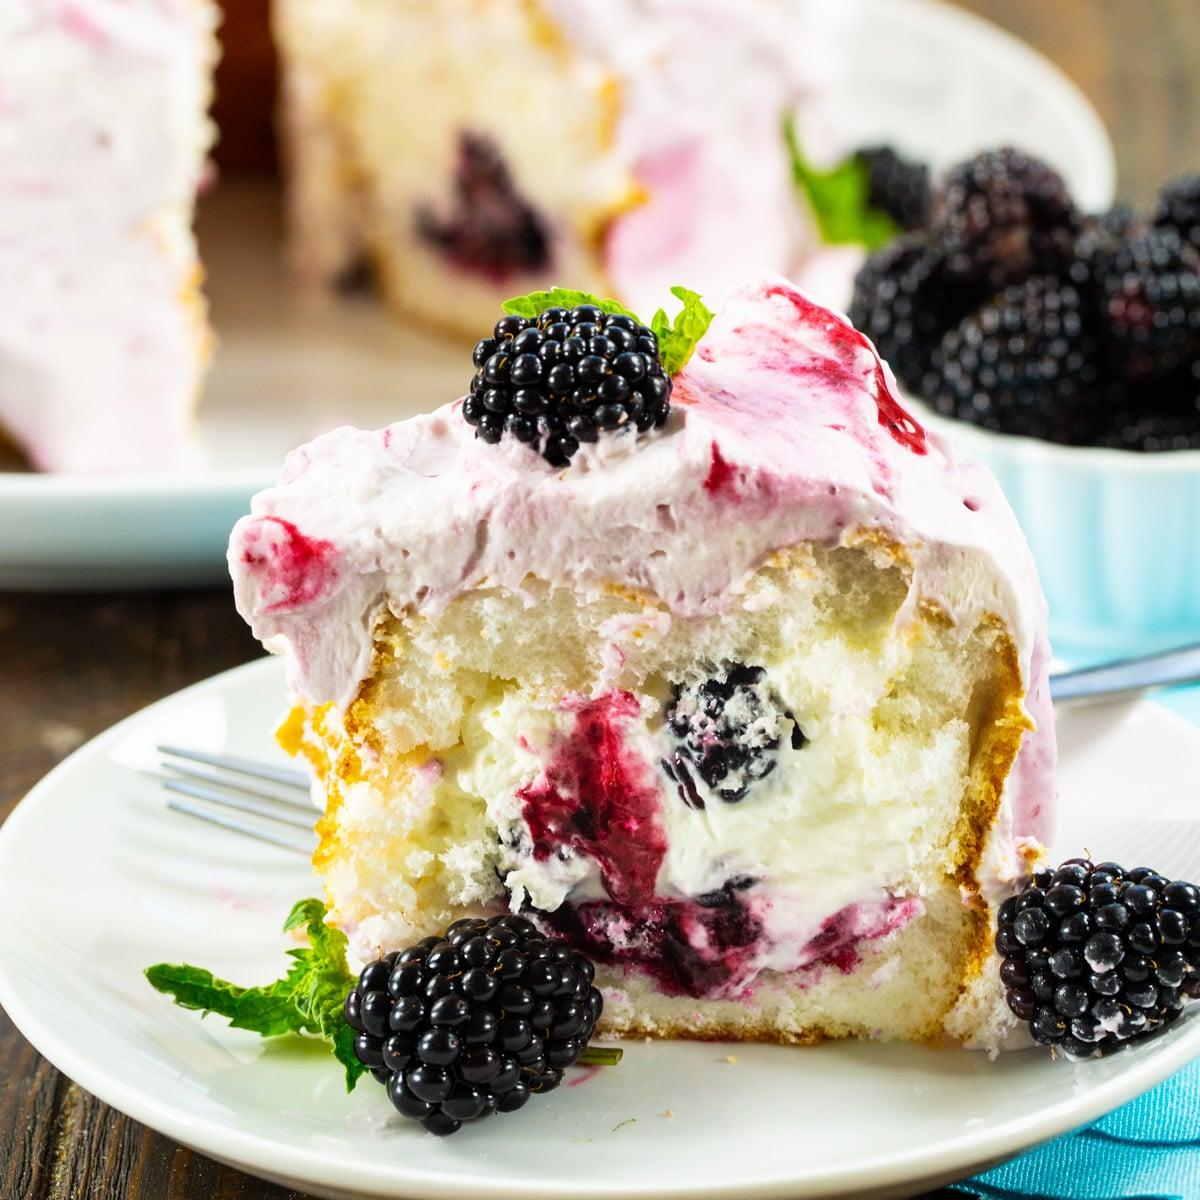 Slice of Blackberries and Cream Angel Food Cake on a plate.